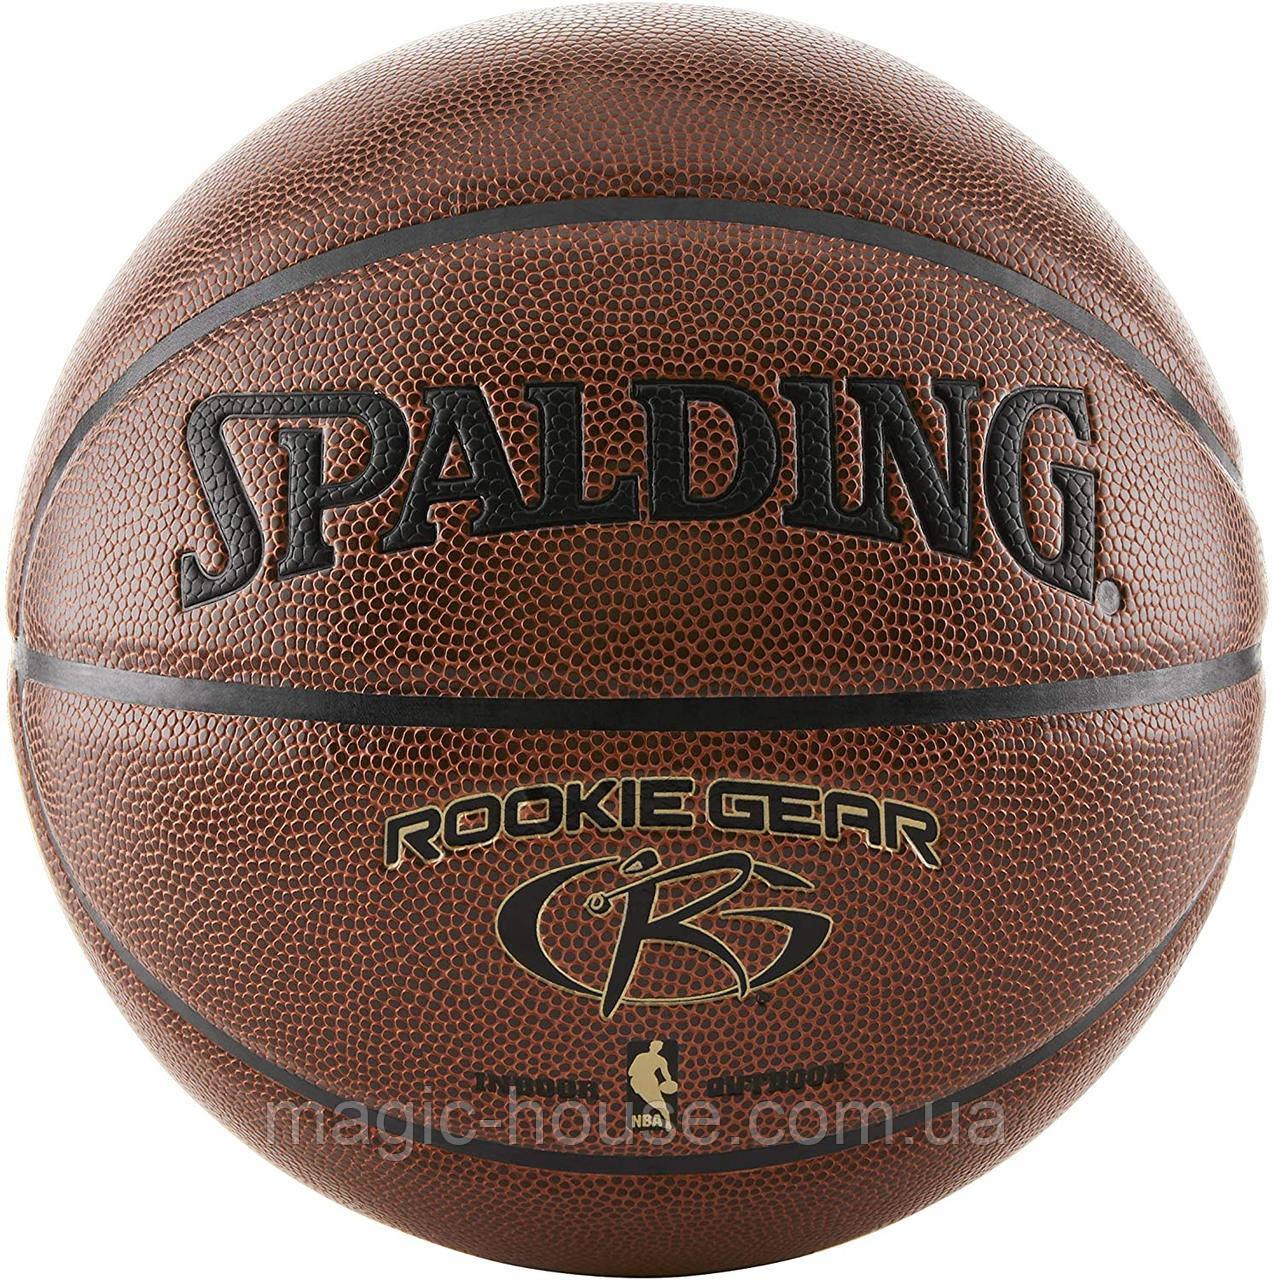 Баскетбольный мяч Спалдинг Spalding Rookie Gear Youth Indoor-Outdoor Basketball Size 5, 27.5 Оригинал